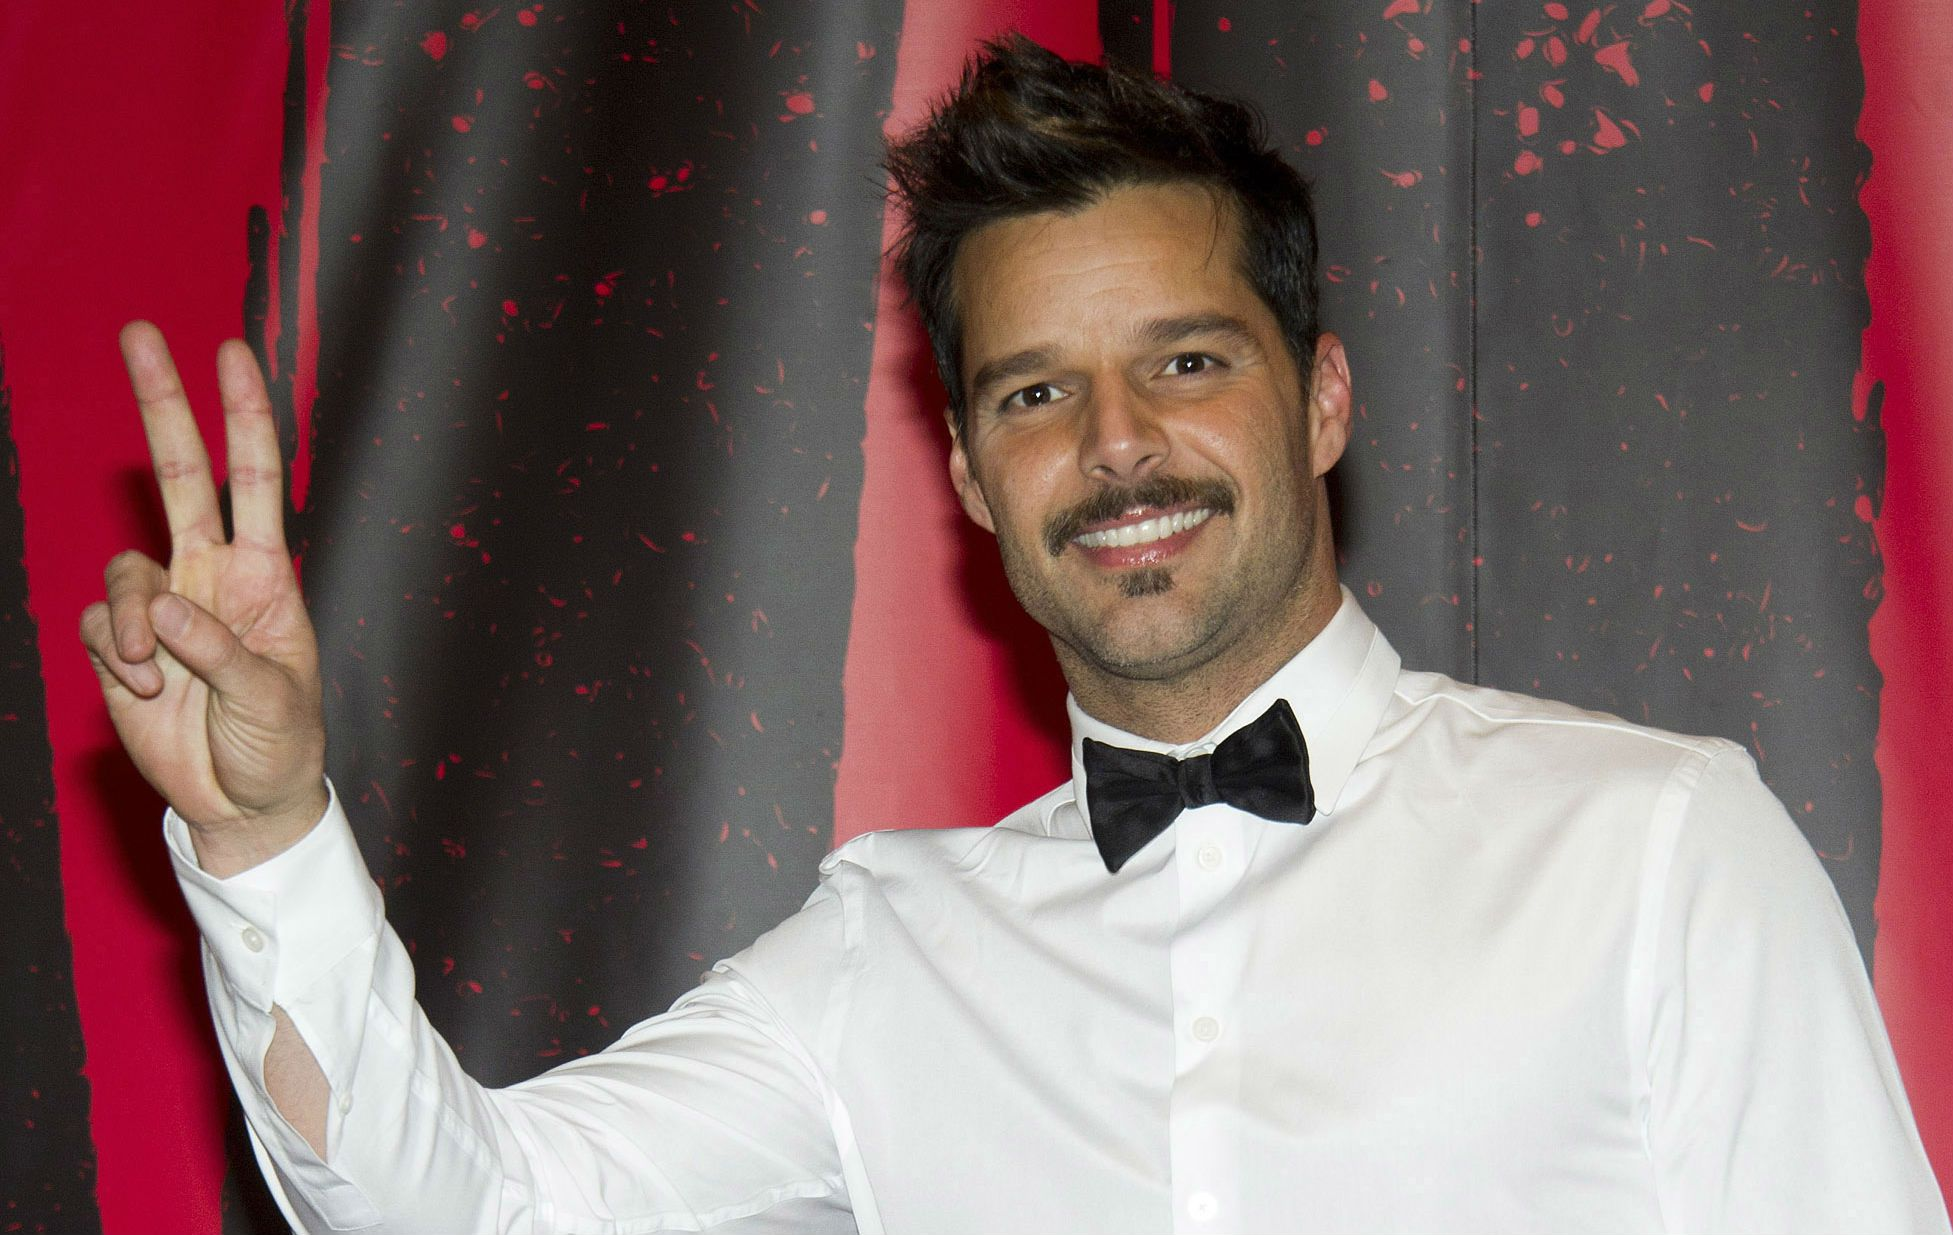 Ricky Martin admitió que adora publicar sus ideas en la red social Twitter.